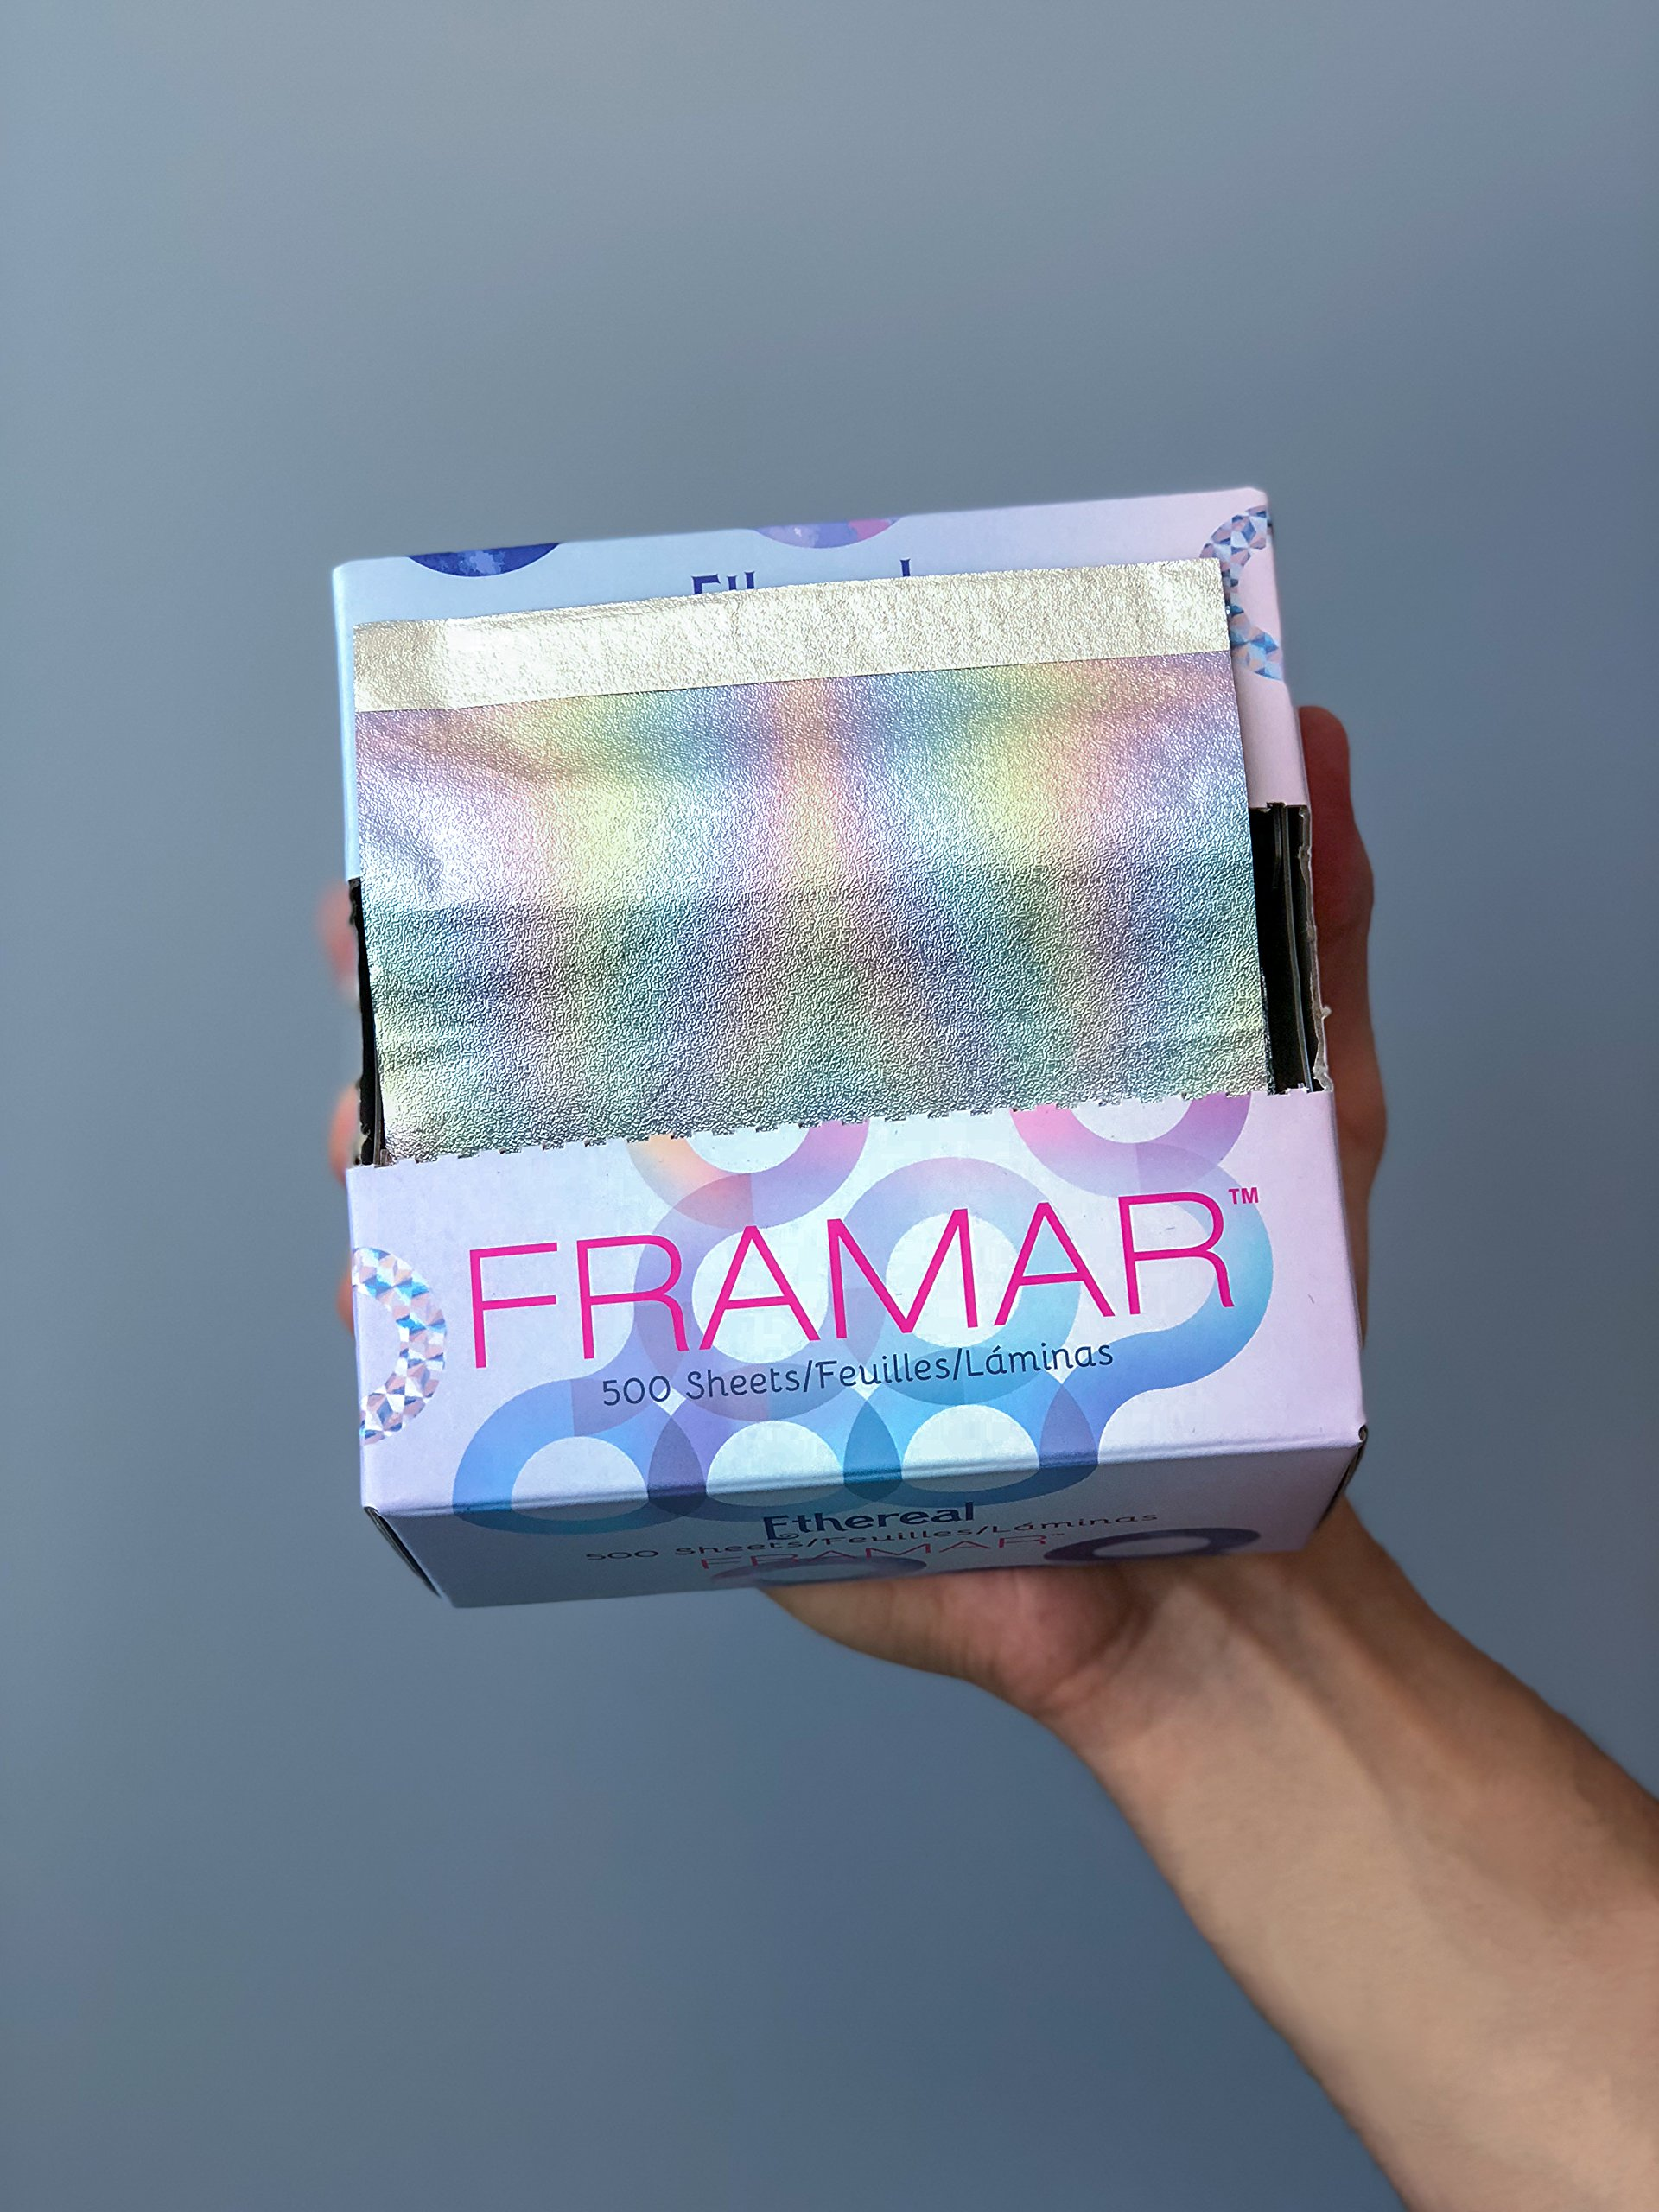 Framar Ethereal Pop Up Foil 5x11-500 Count by Framar (Image #4)